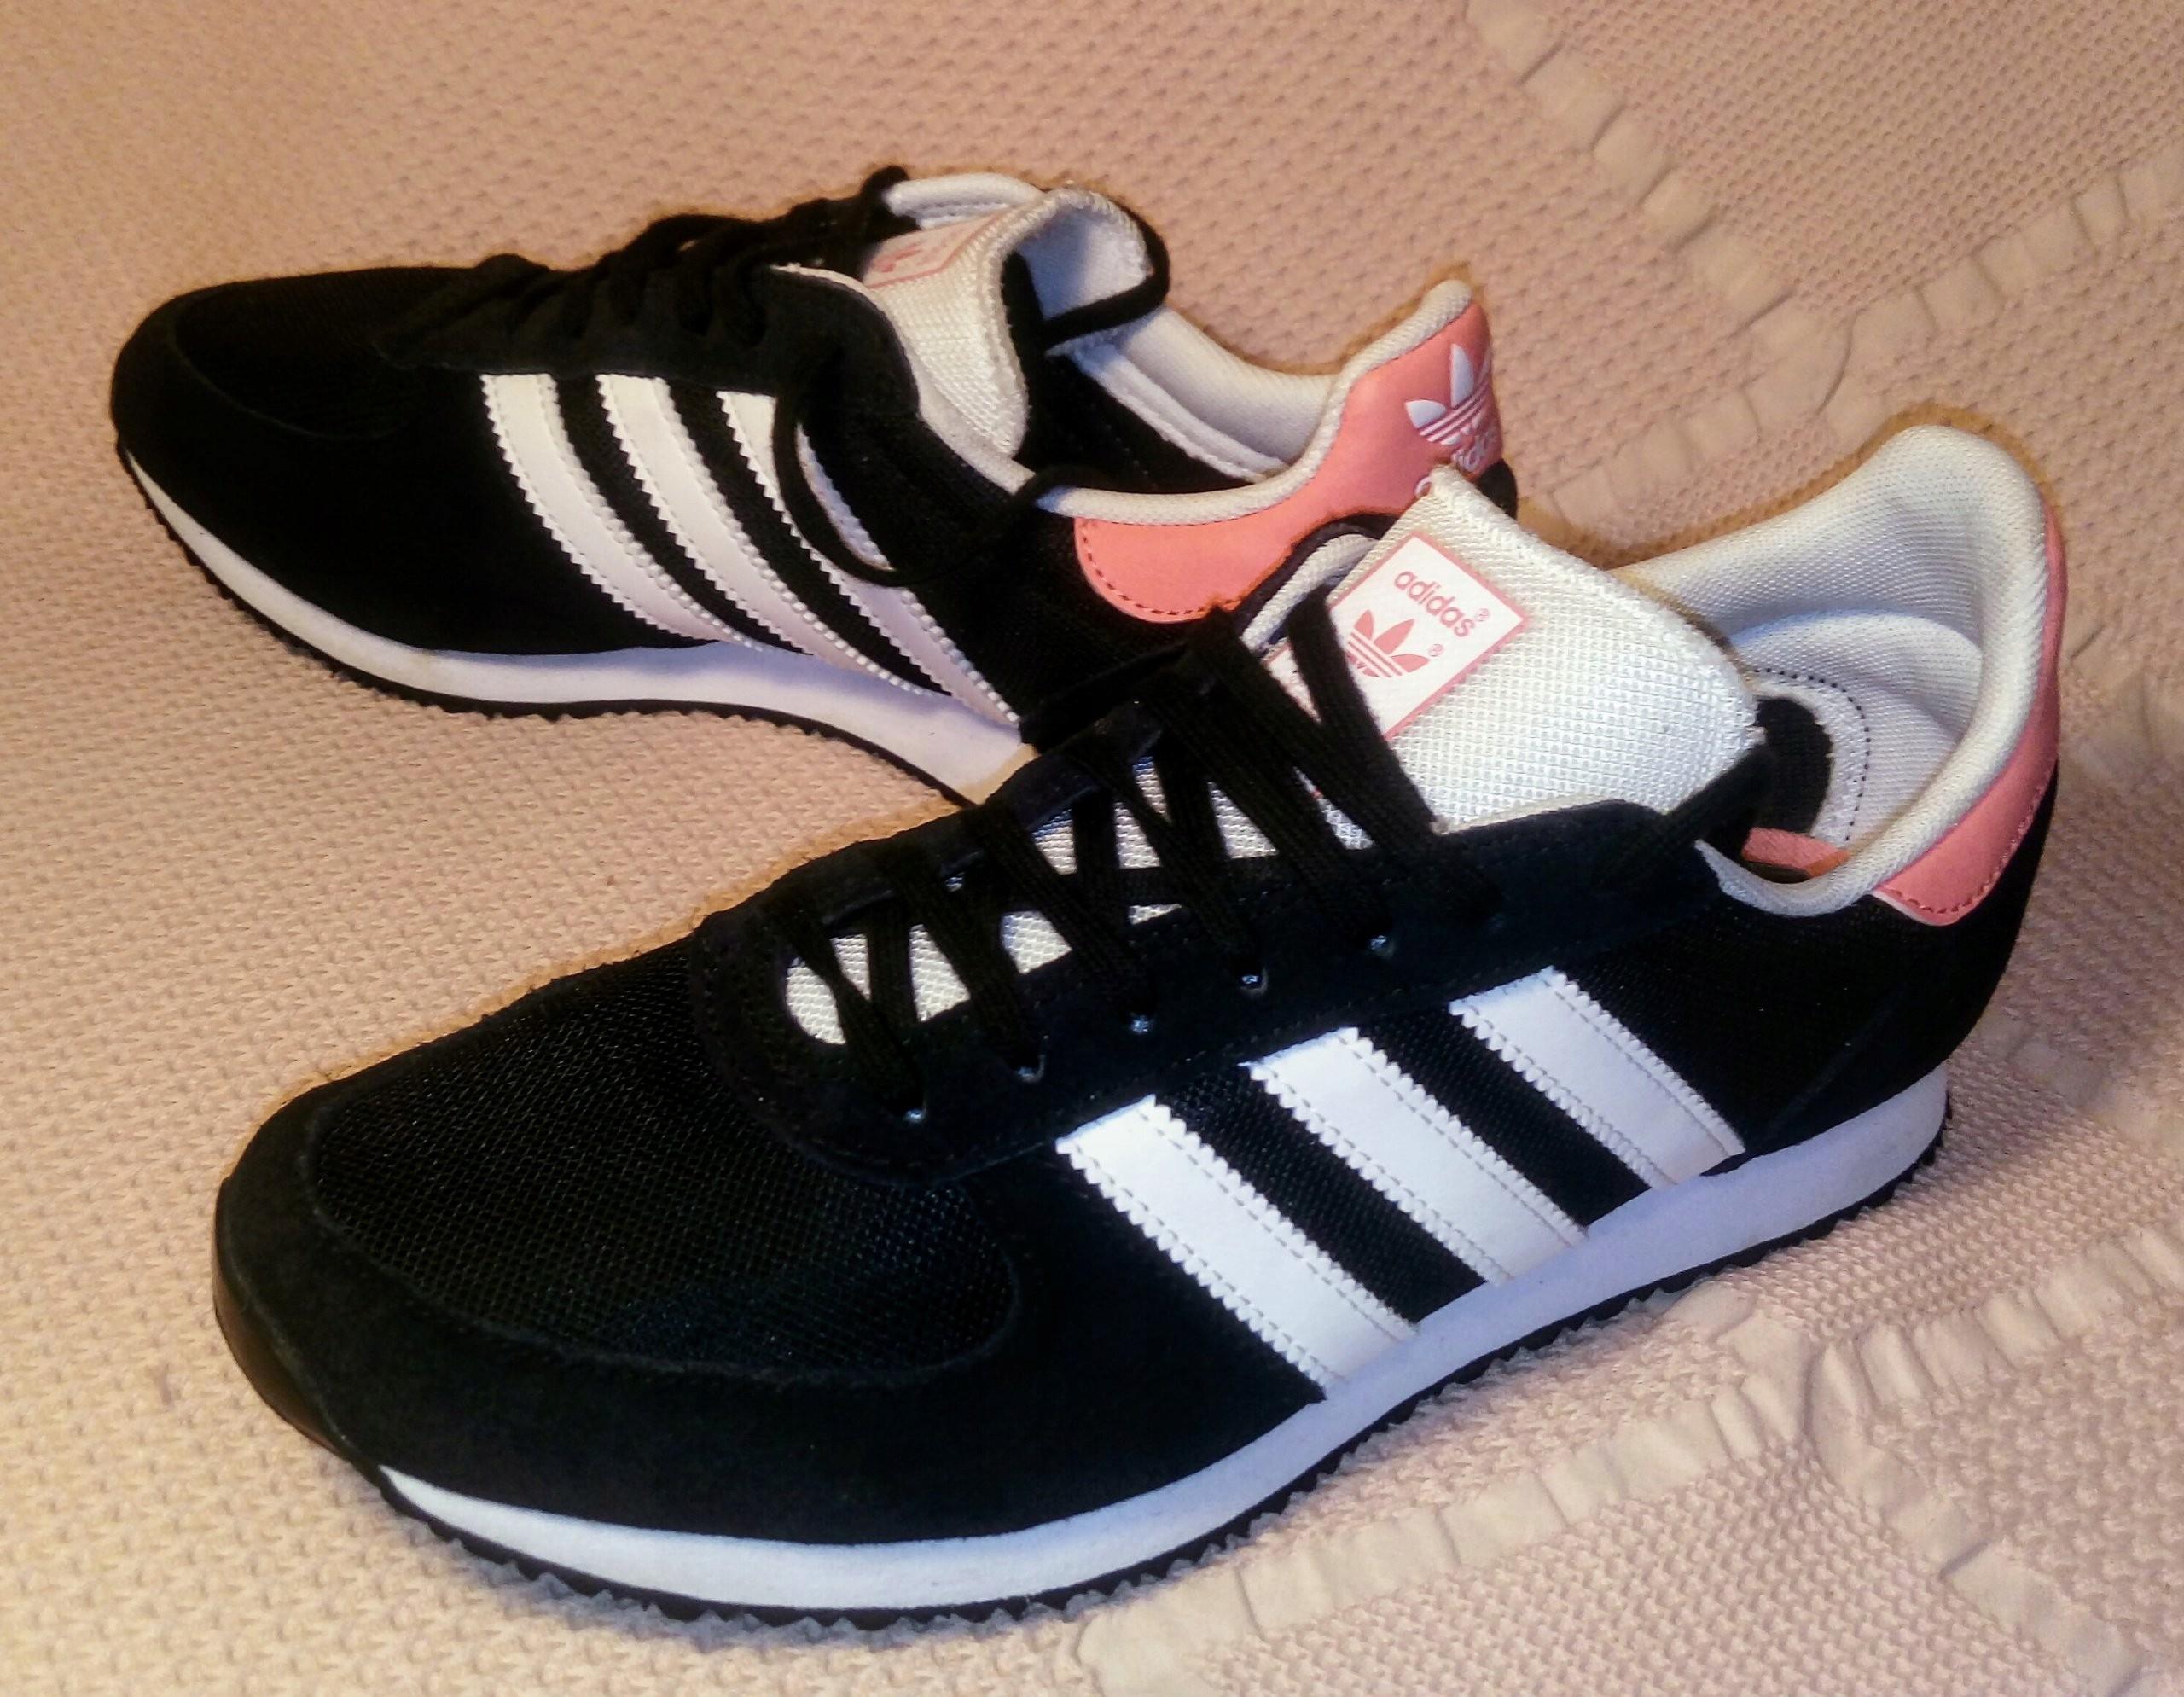 new product 6d8e9 cd715 Nowe damske adidas zx racer ( original) - 7382138187 ...